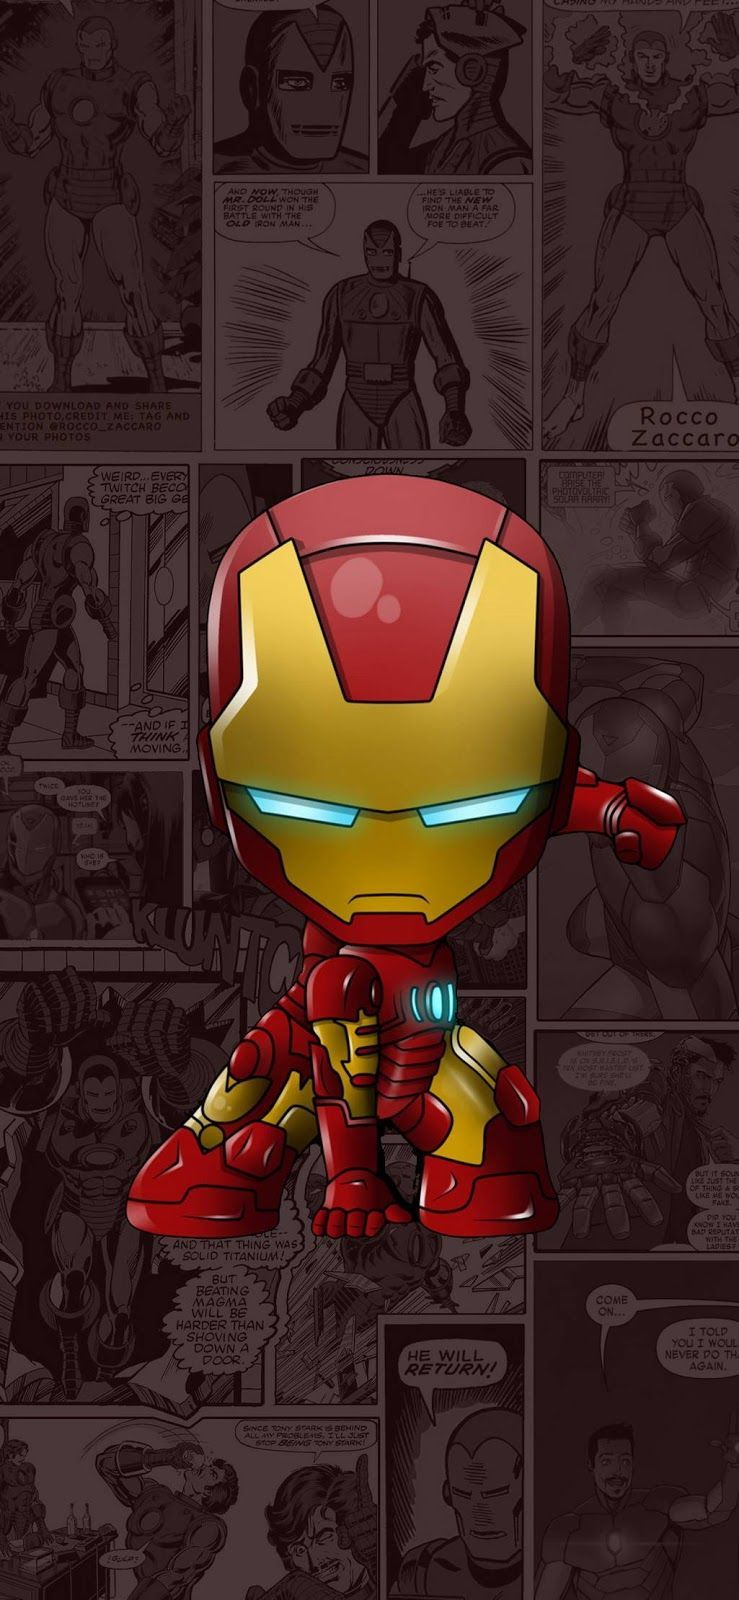 Ironman Cartoon Wallpapers Top Free Ironman Cartoon Backgrounds Wallpaperaccess